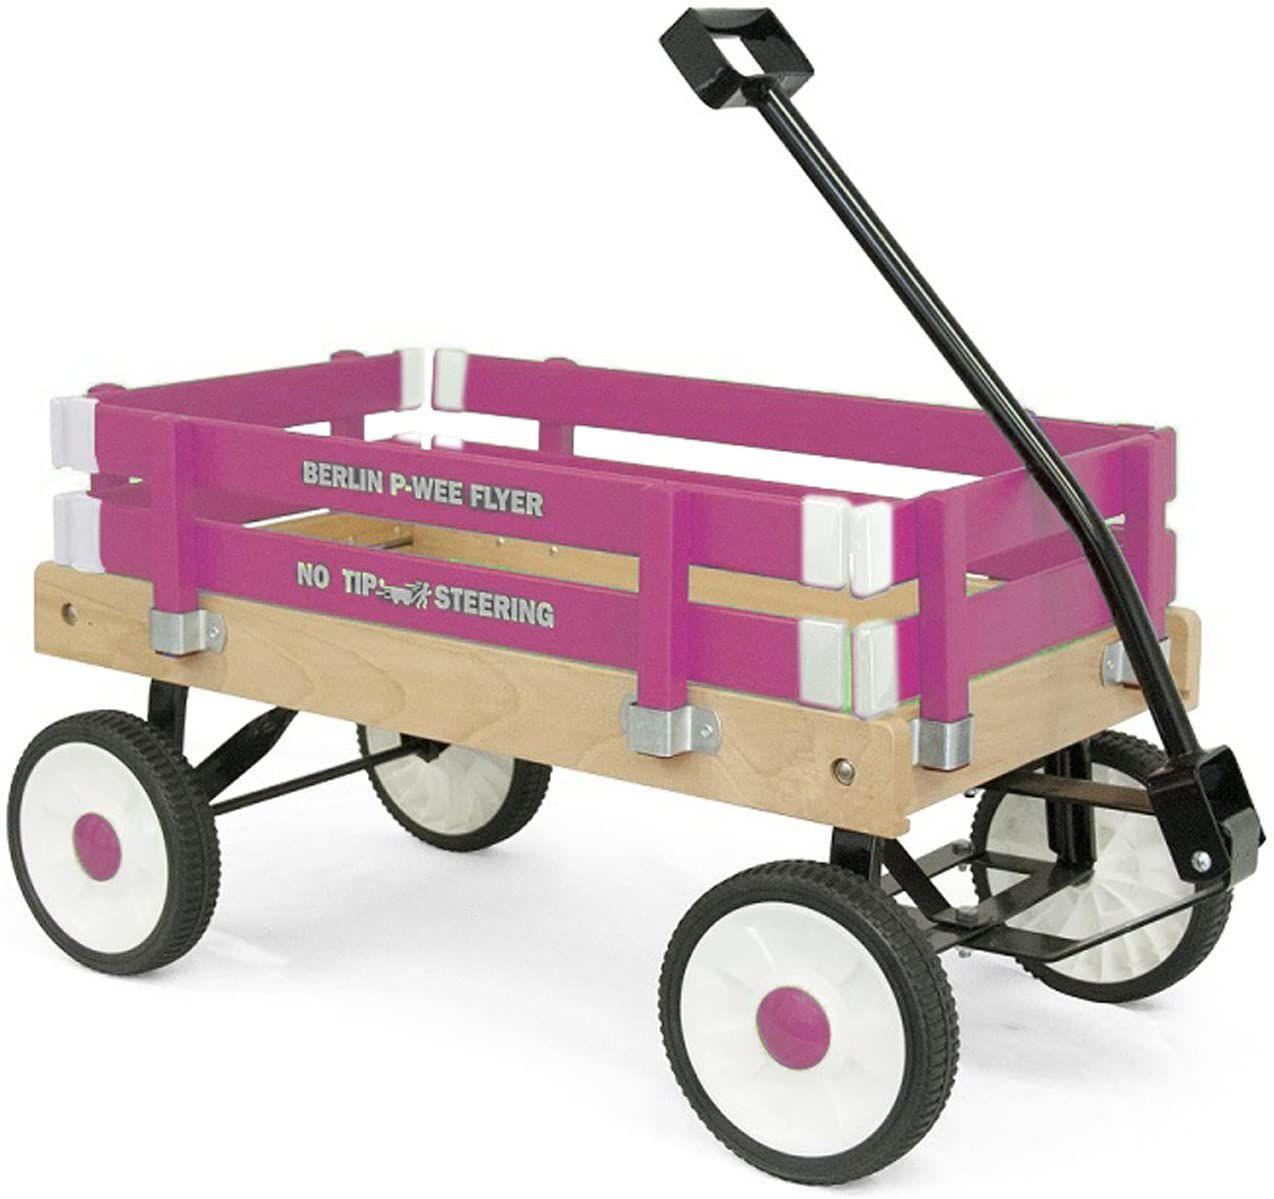 Berlin Pee-Wee Flyer Ride-On Wagon